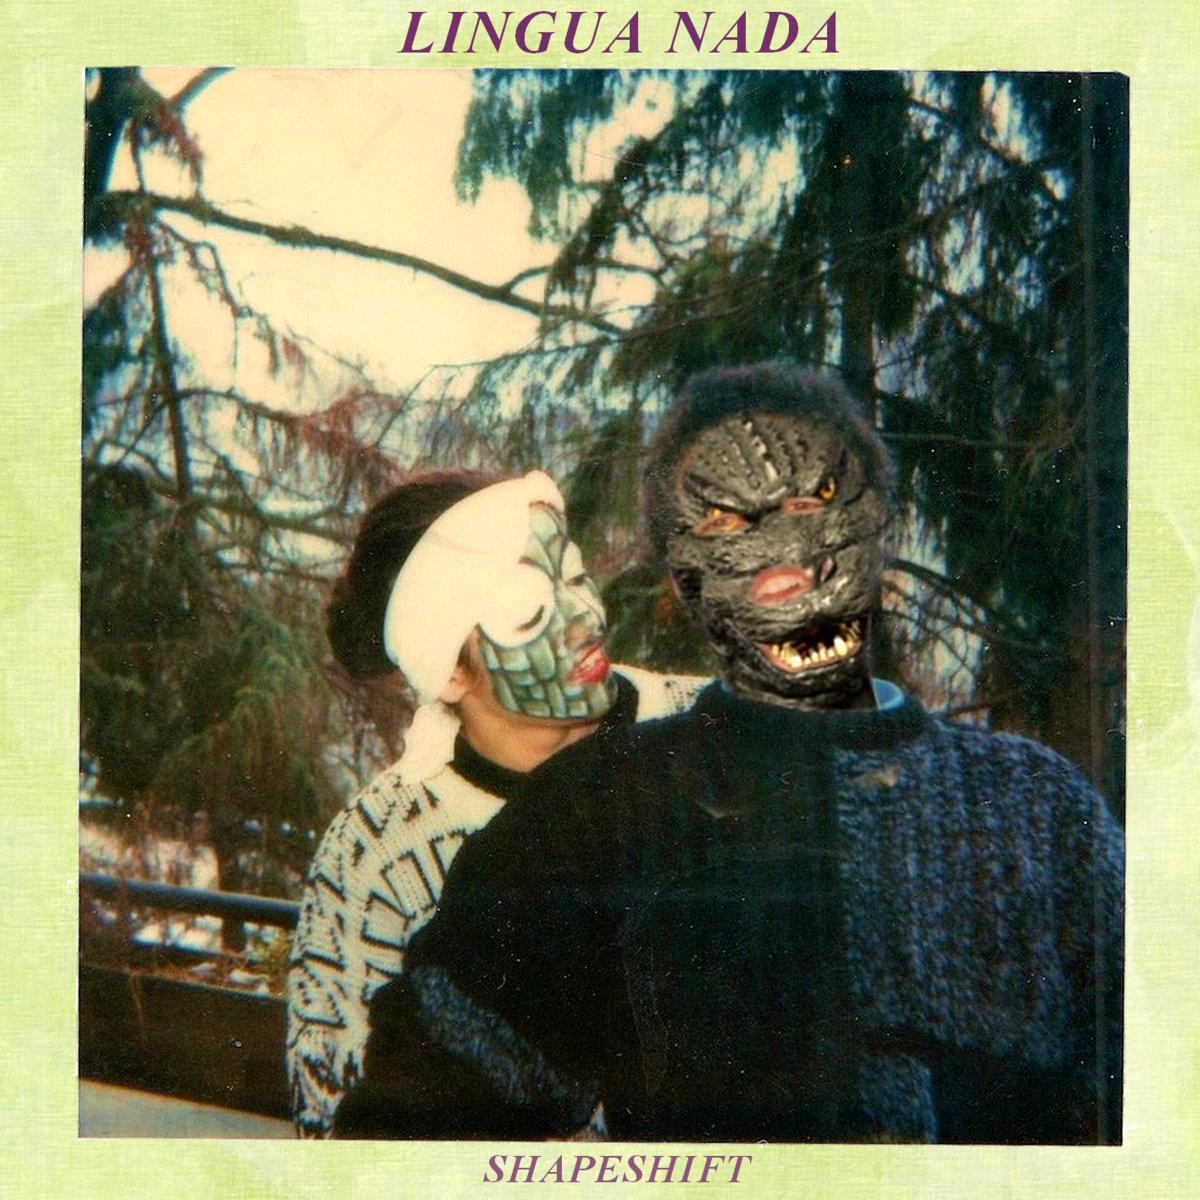 LINGUA NADA - Shapeshift